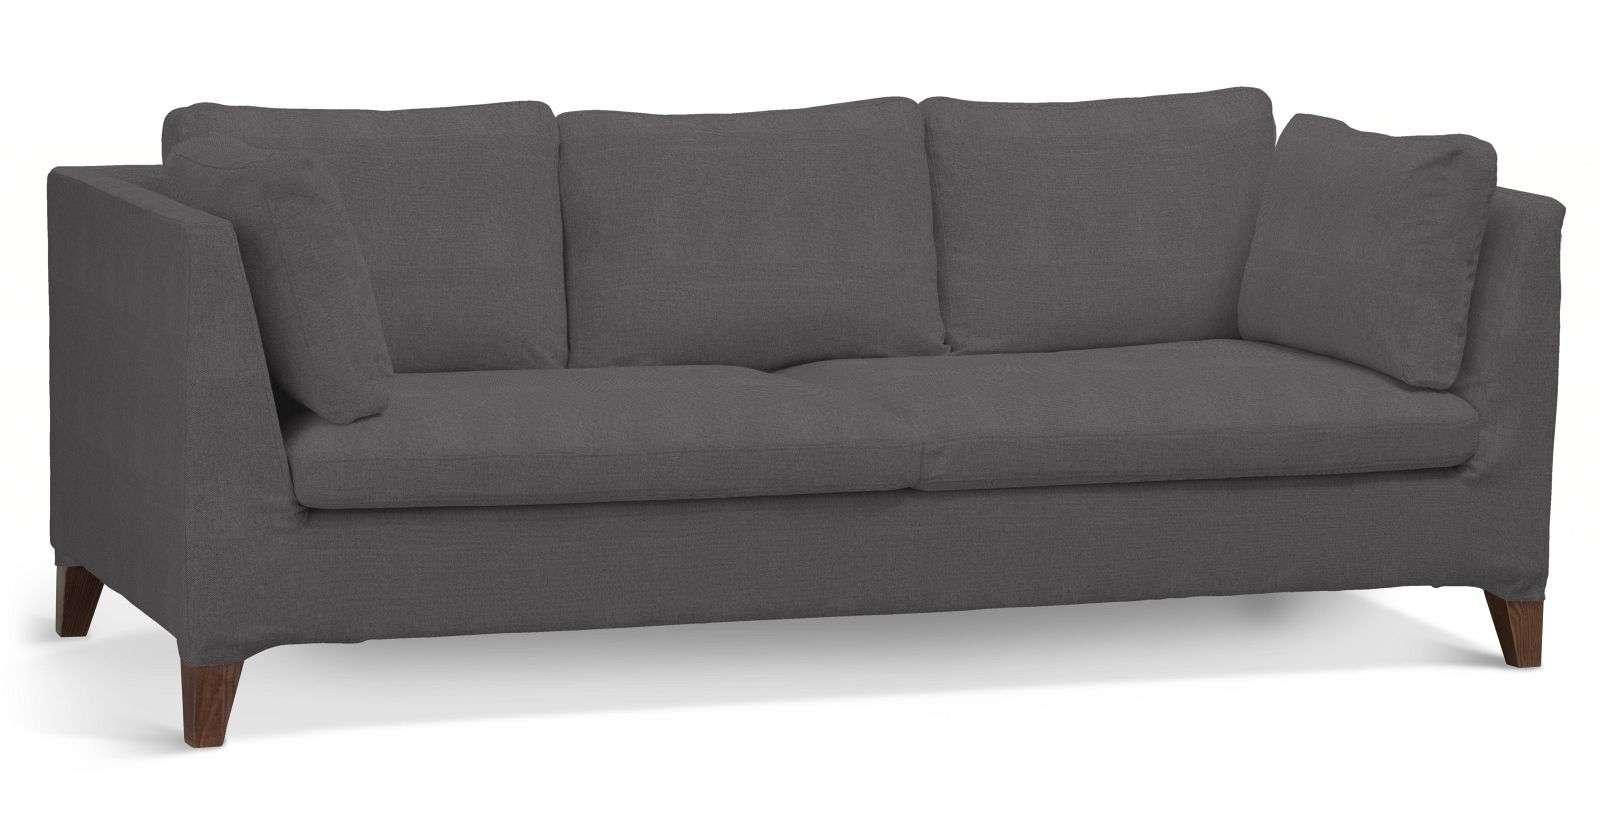 Užvalkalas IKEA trivietei sofai Stockholm  IKEA sofa Stockholm trivietė kolekcijoje Etna , audinys: 705-35